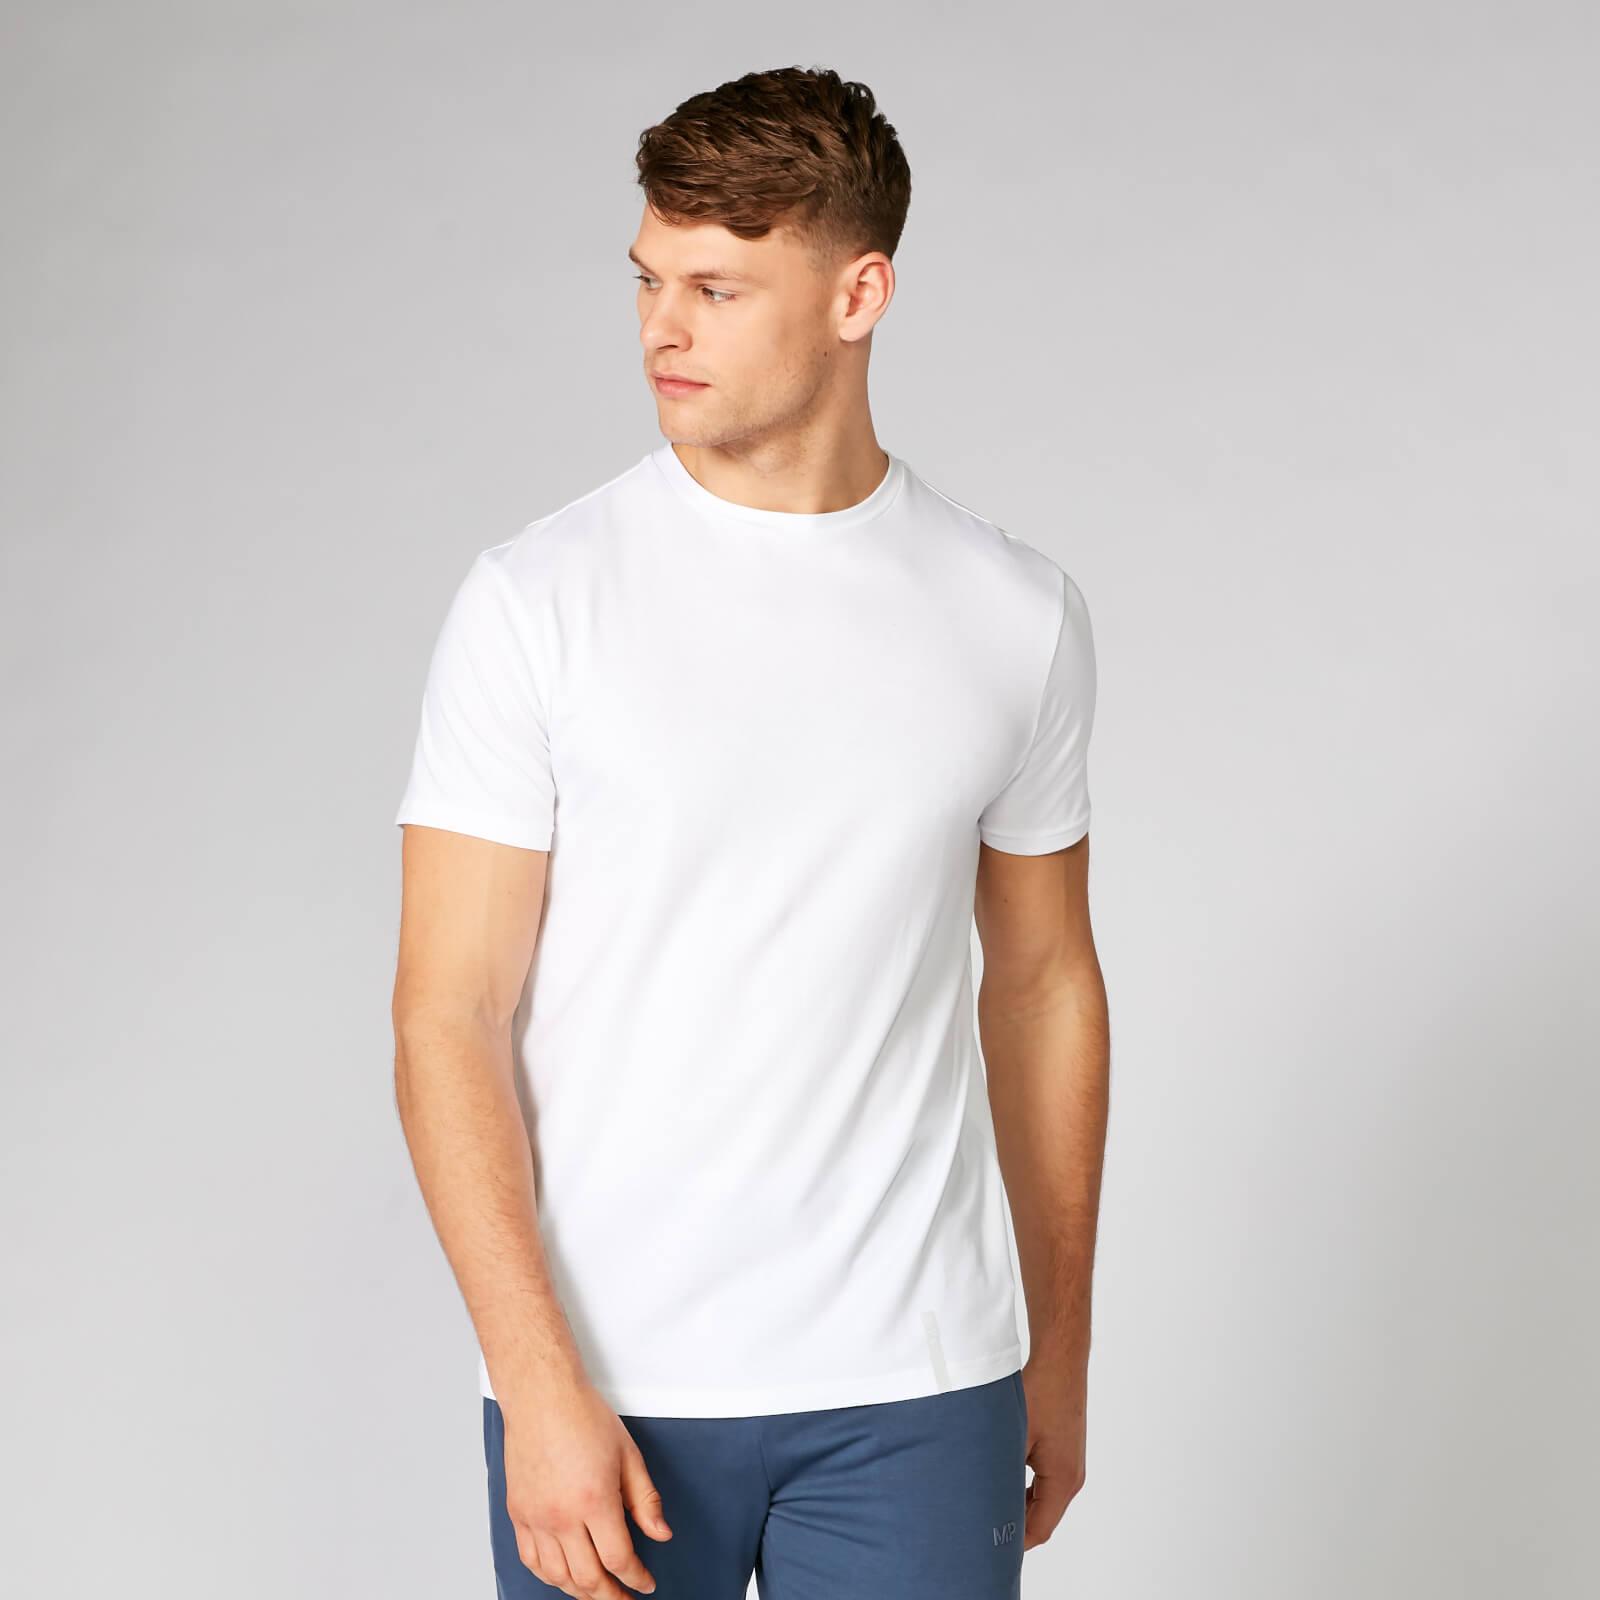 Myprotein Luxe Classic Crew T-Shirt - White - XXL